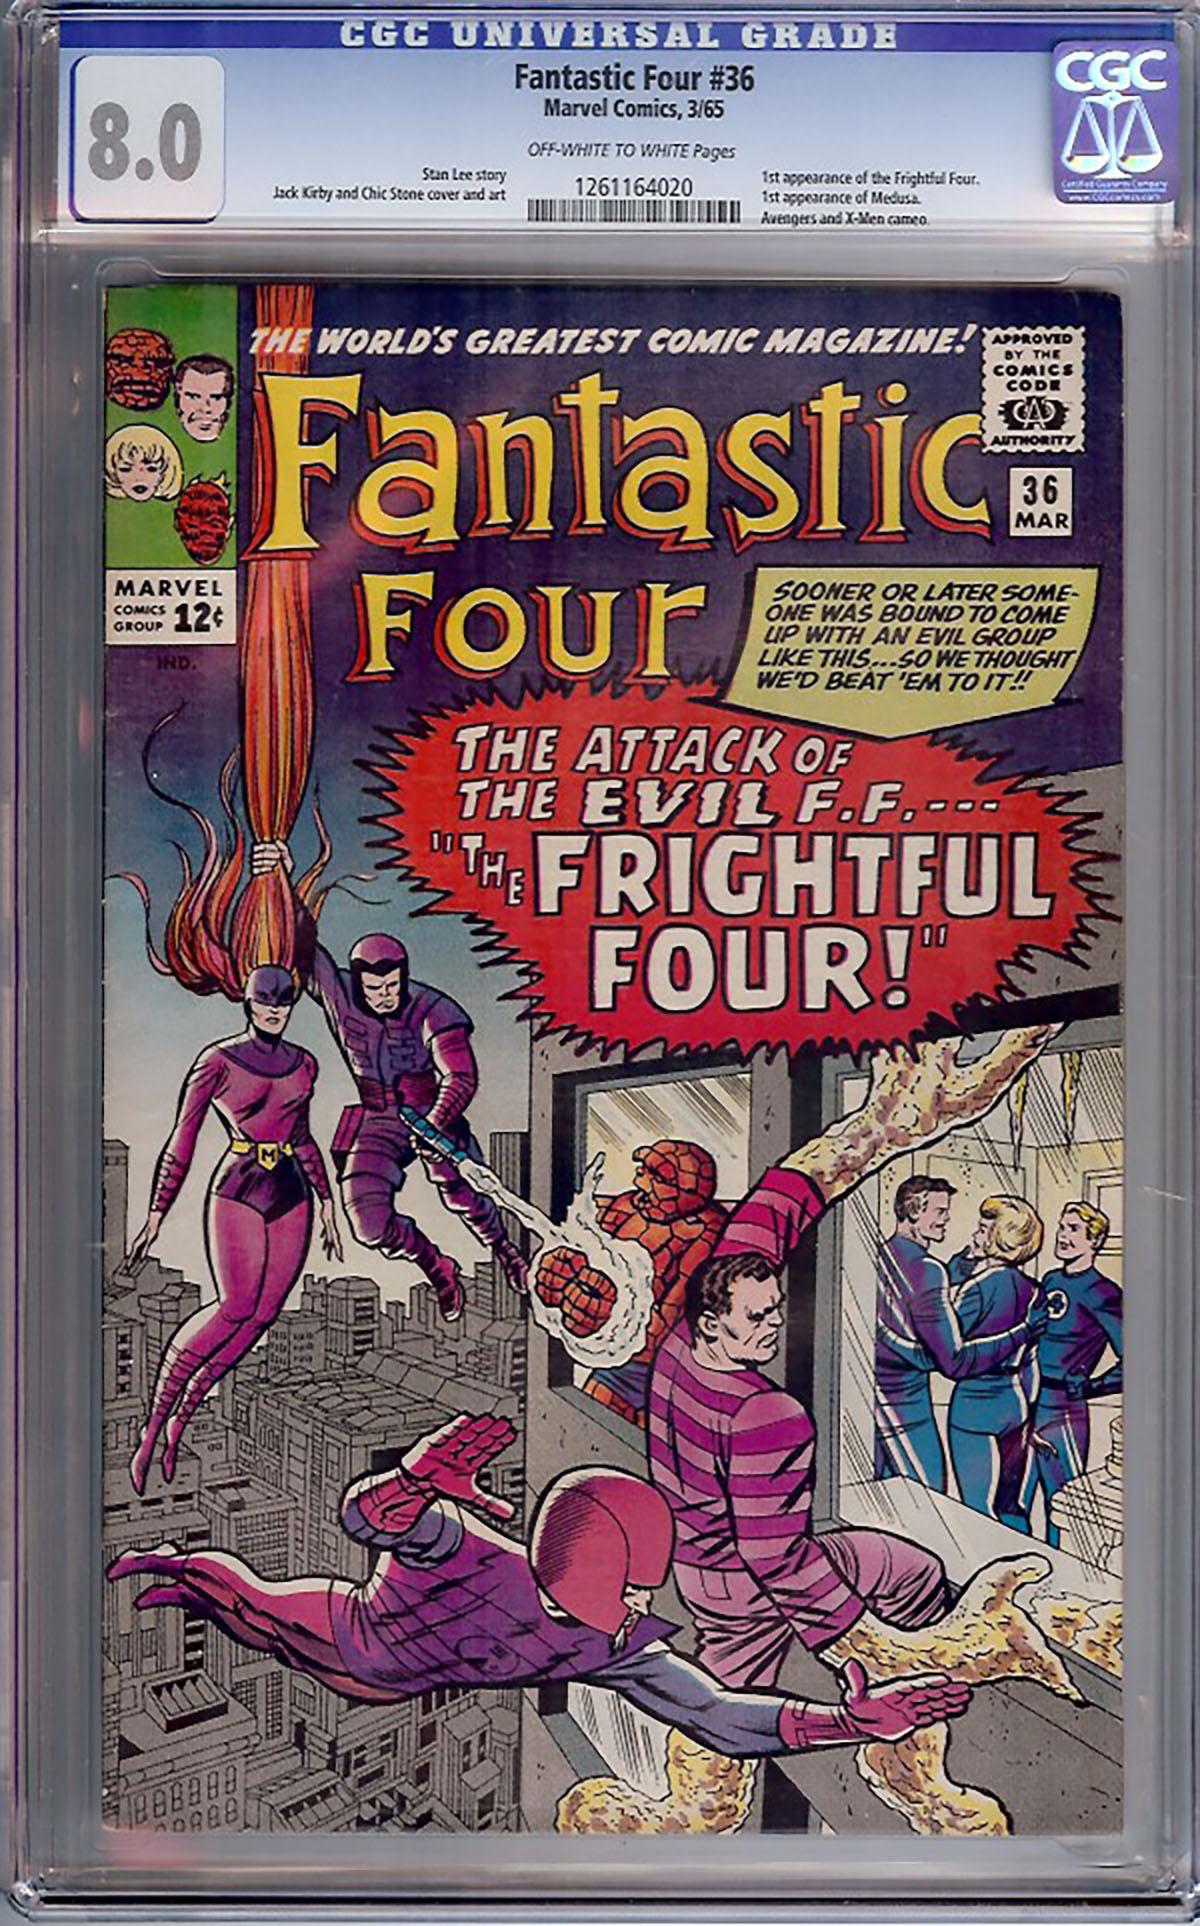 Fantastic Four #36 CGC 8.0 ow/w